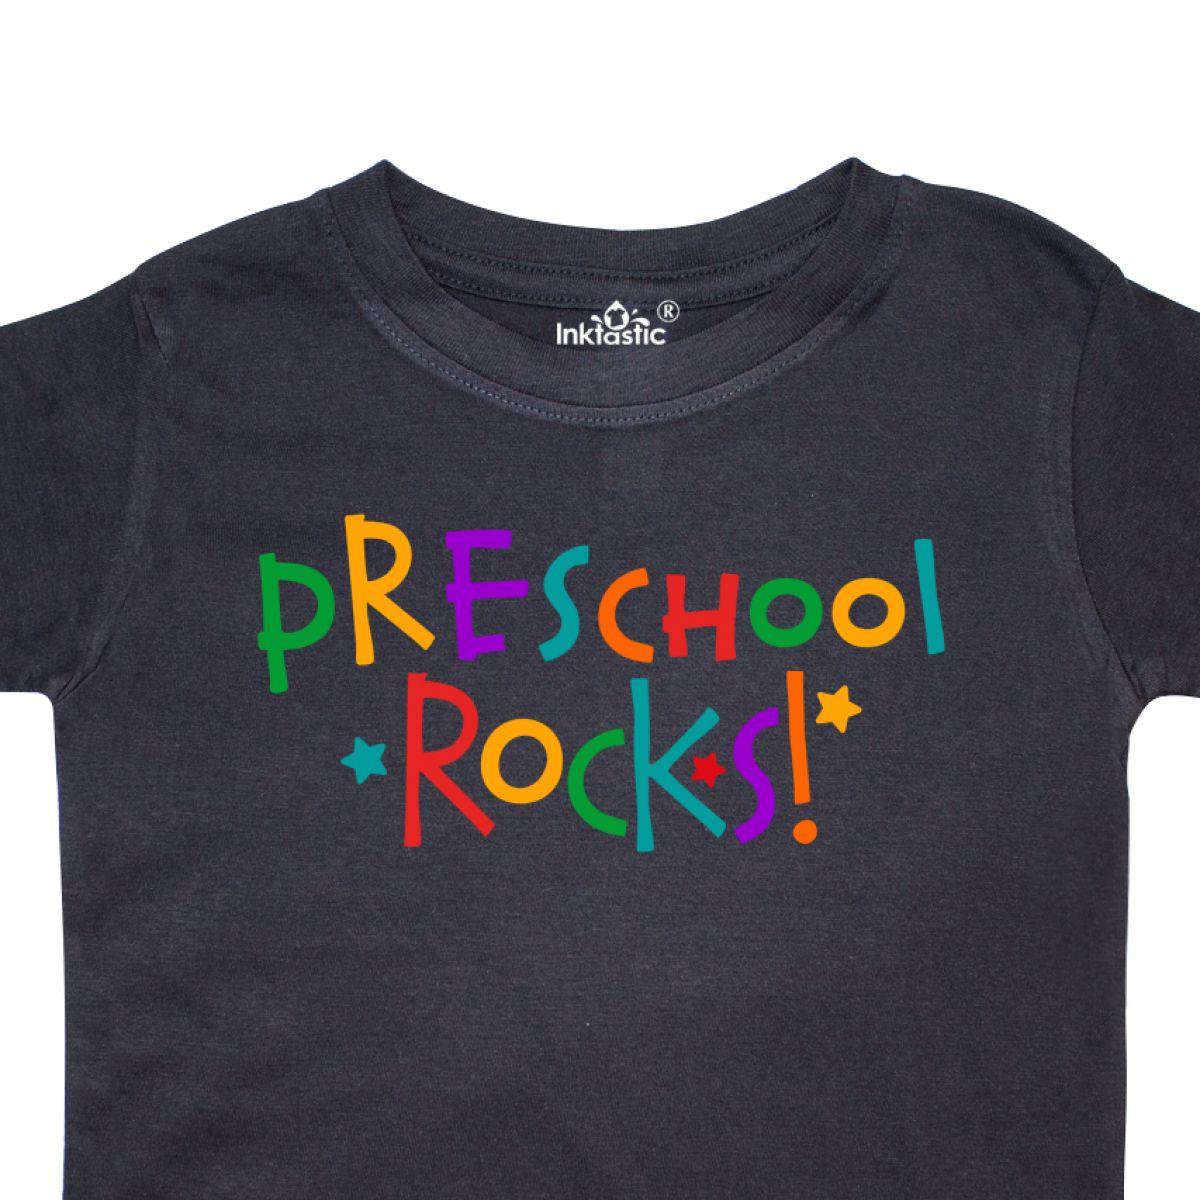 e07b1e0ceb Inktastic Preschool Rocks Toddler T-Shirt Pre-k Back To School Cute ...